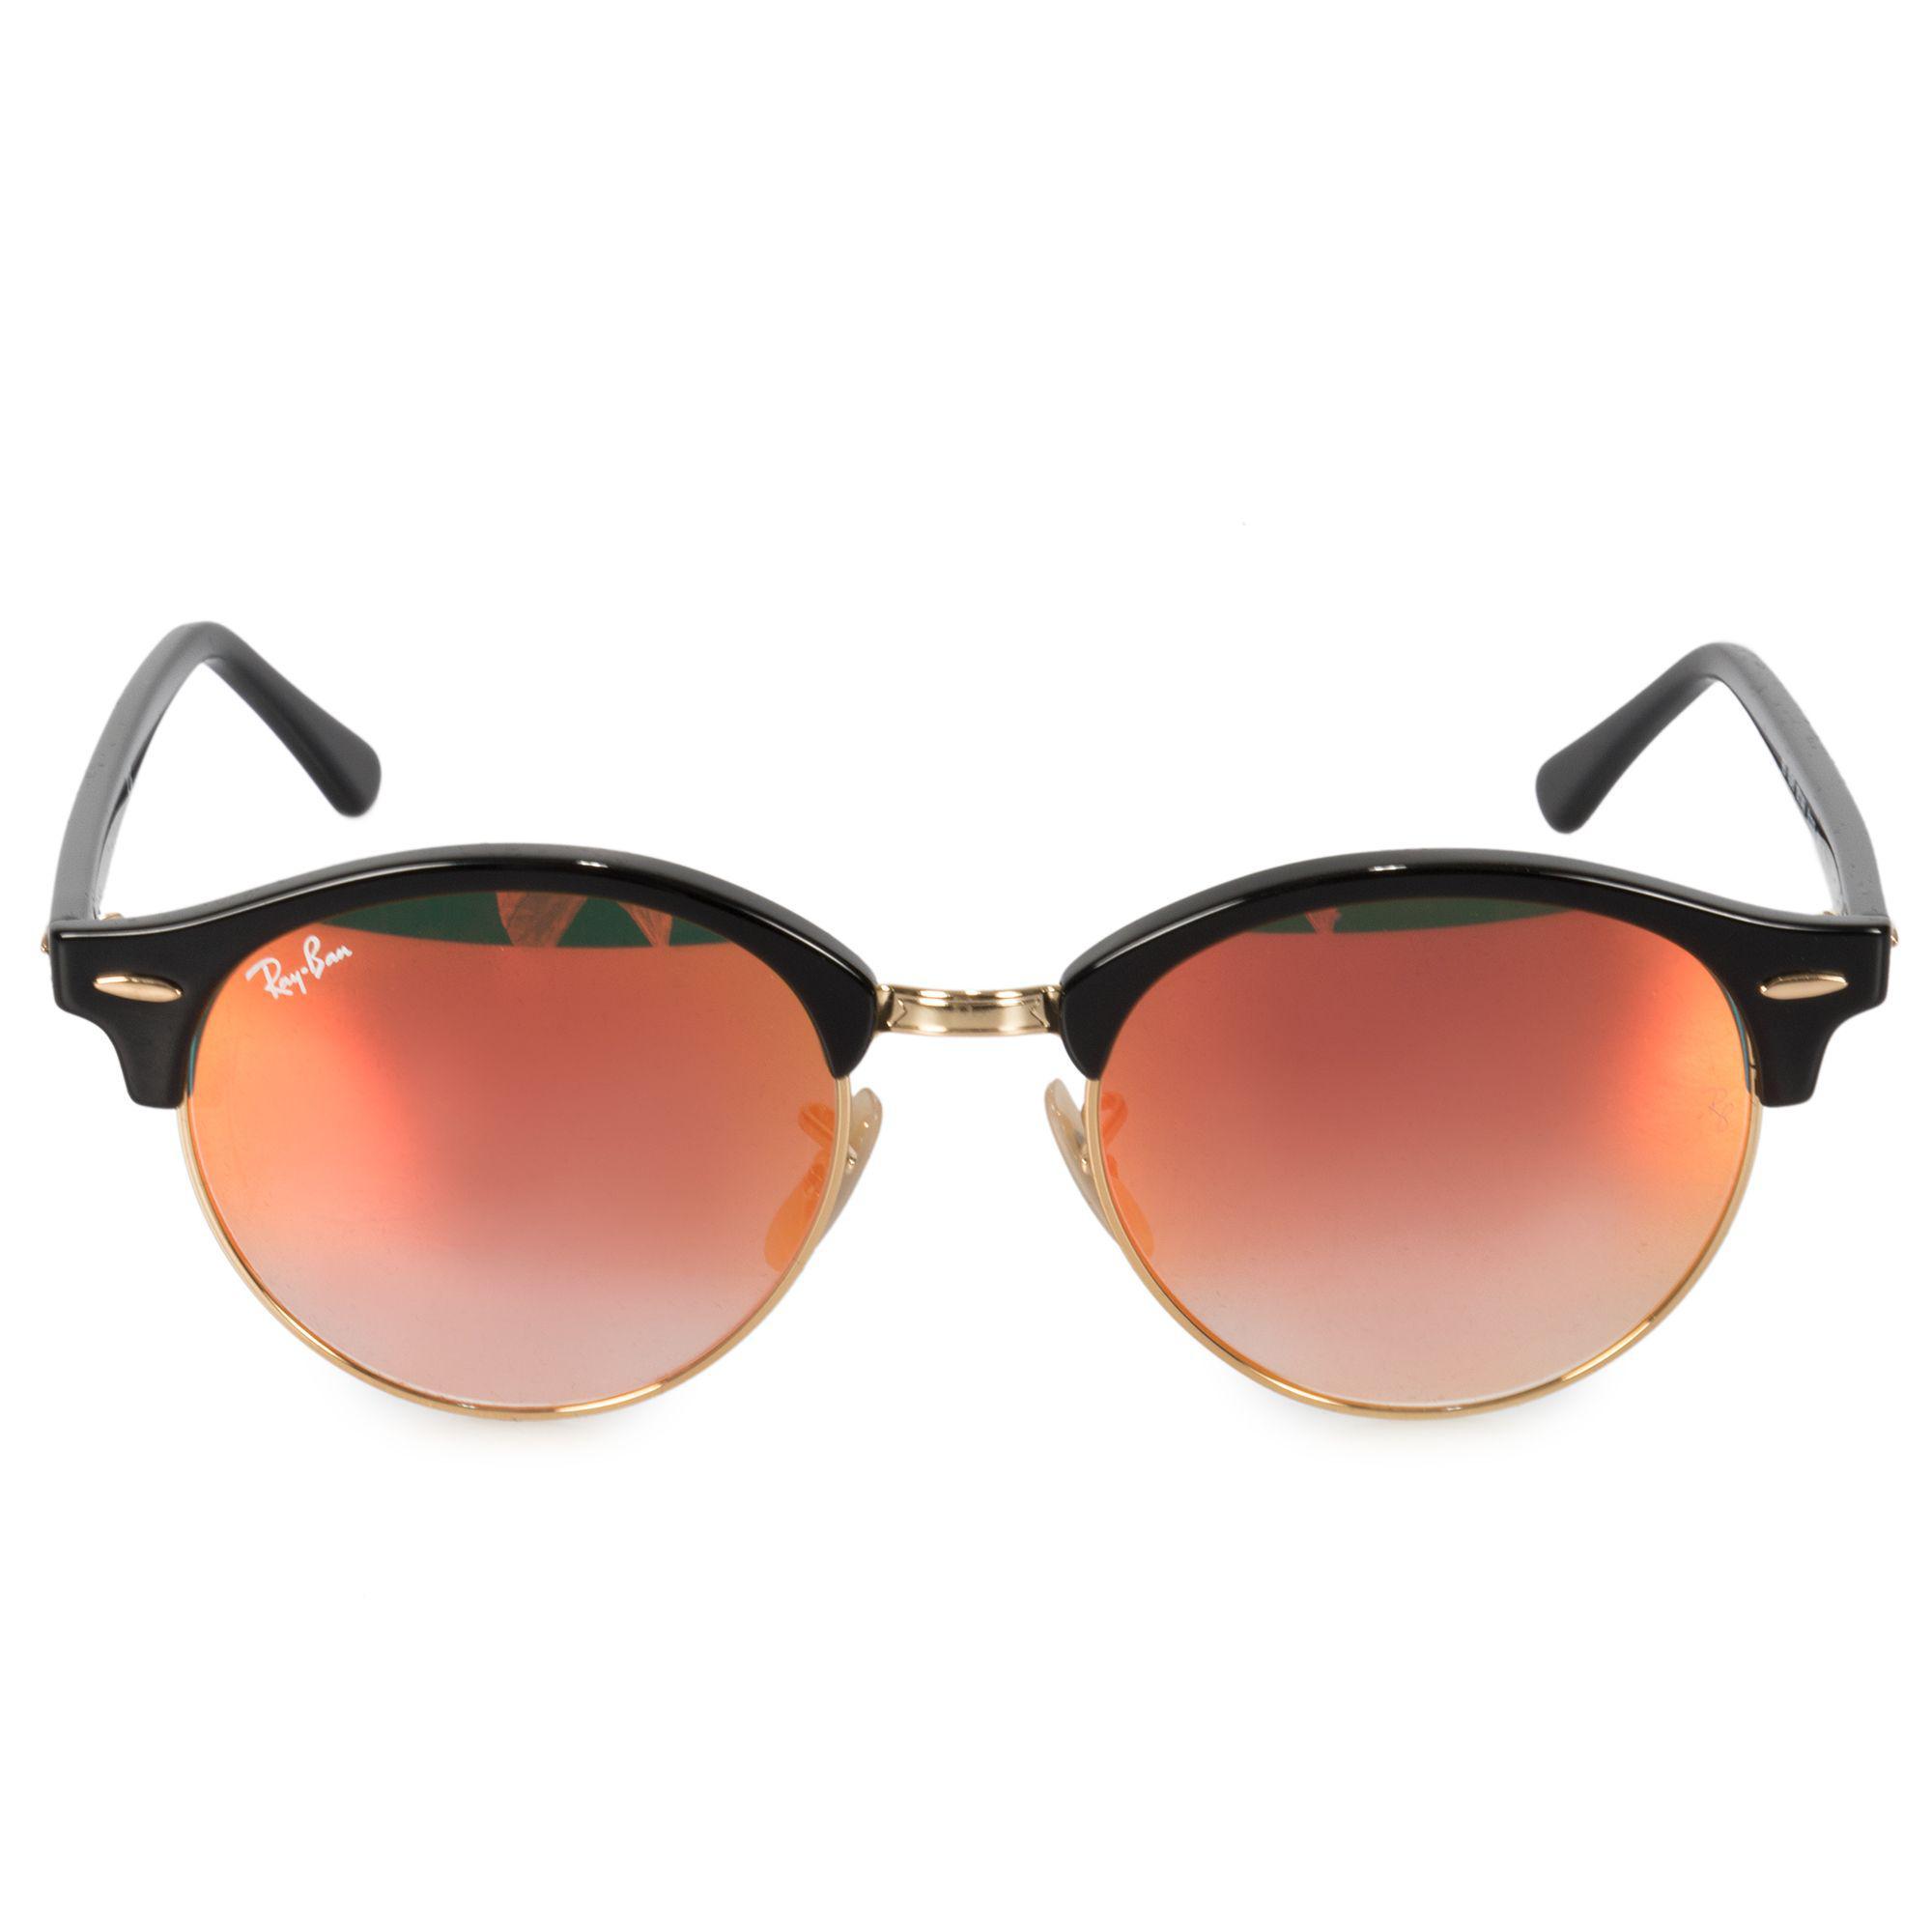 6ee2ecf83ba Ray-Ban. Women s Clubround Classic Sunglasses Rb4246 901 4w 51